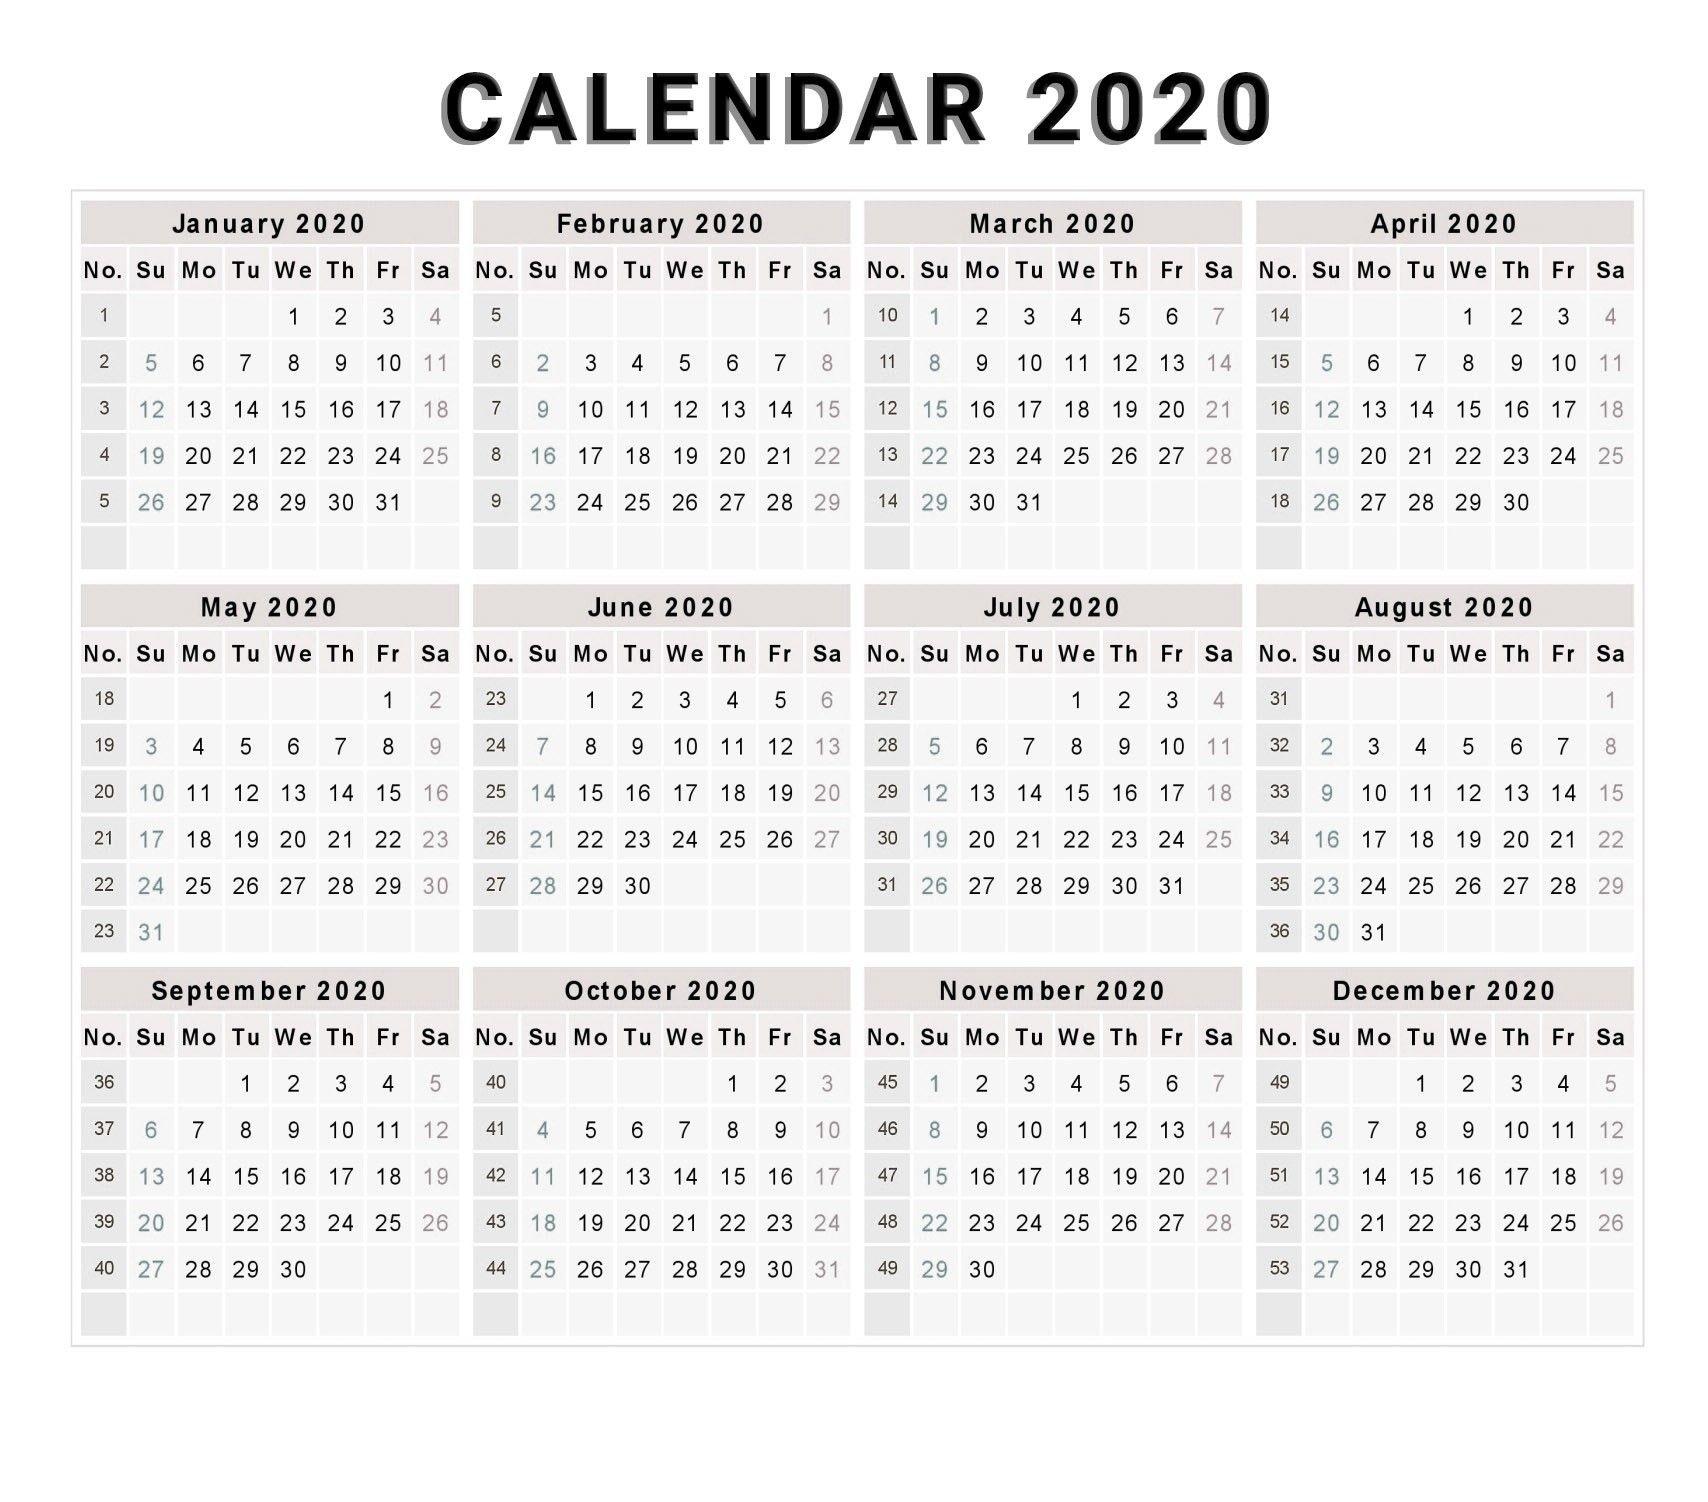 Calendar 2020 Free Printable Calendar 2020 Free 2020 Extraordinary Calendar Template 2020 Printable Free Black And White